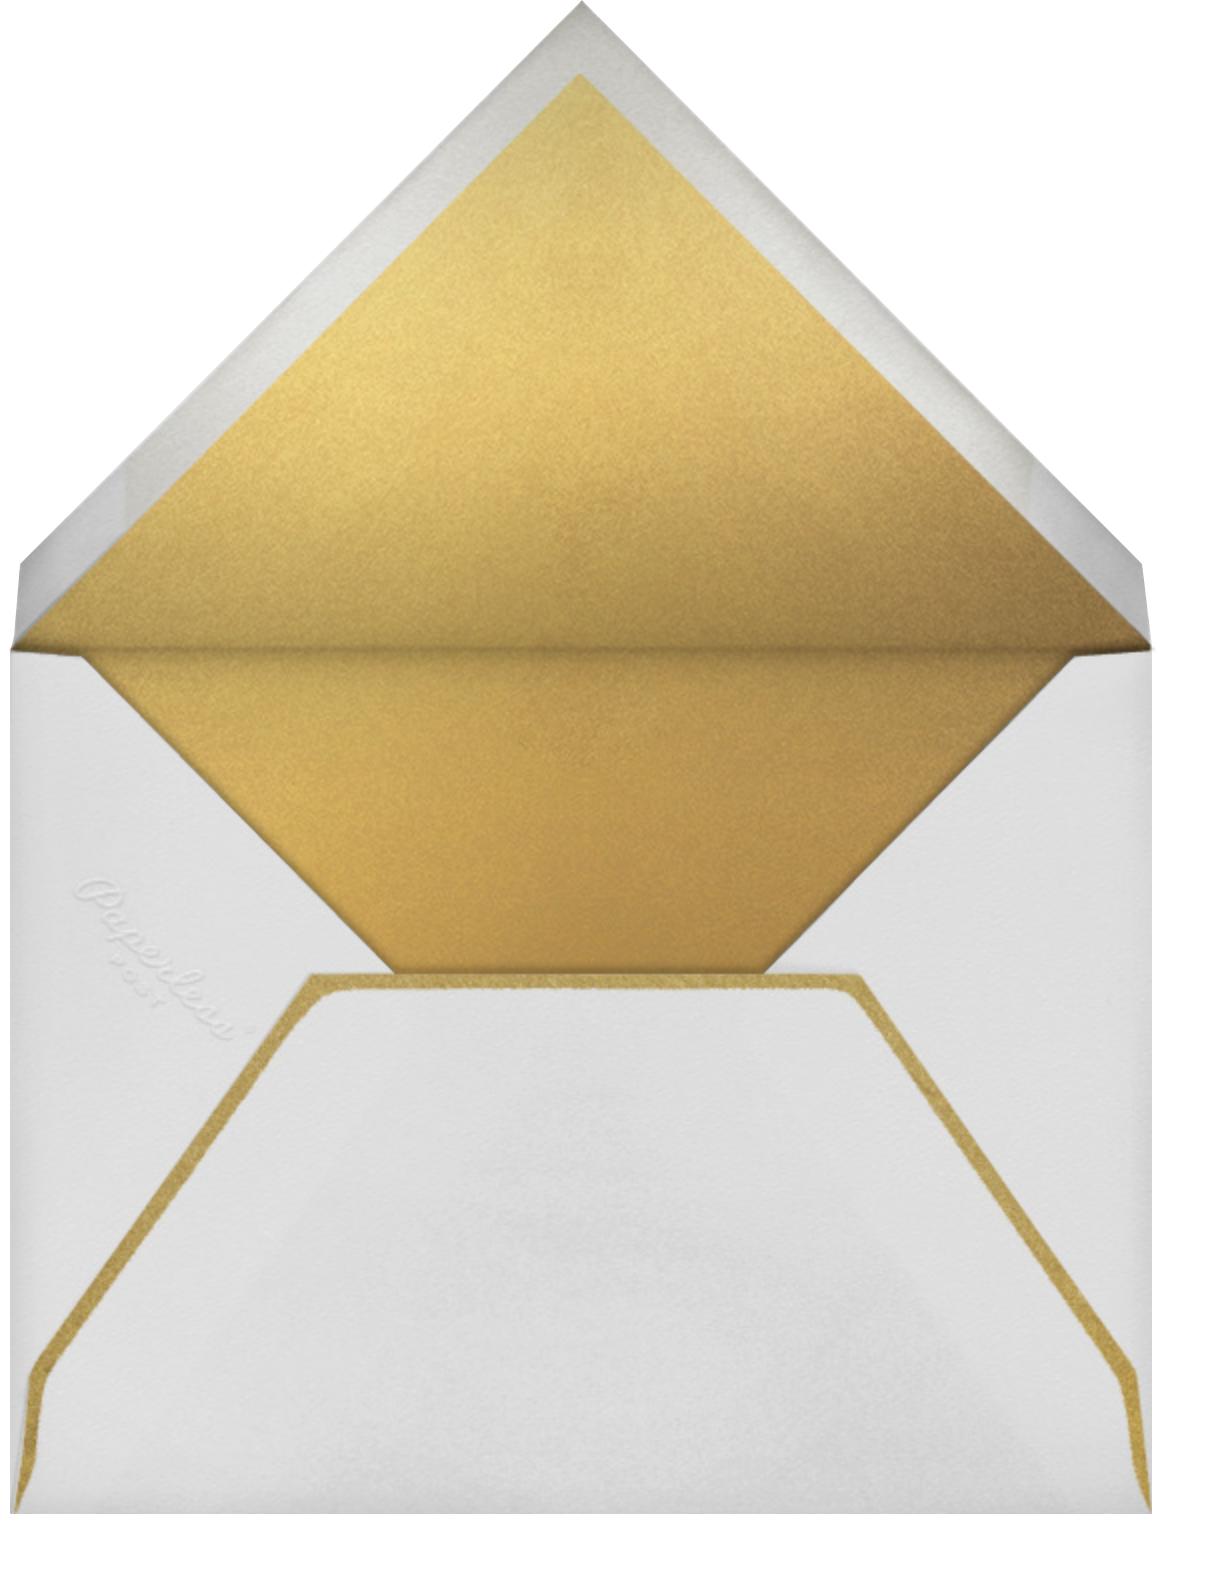 Niwas (Invitation) - Paperless Post - All - envelope back